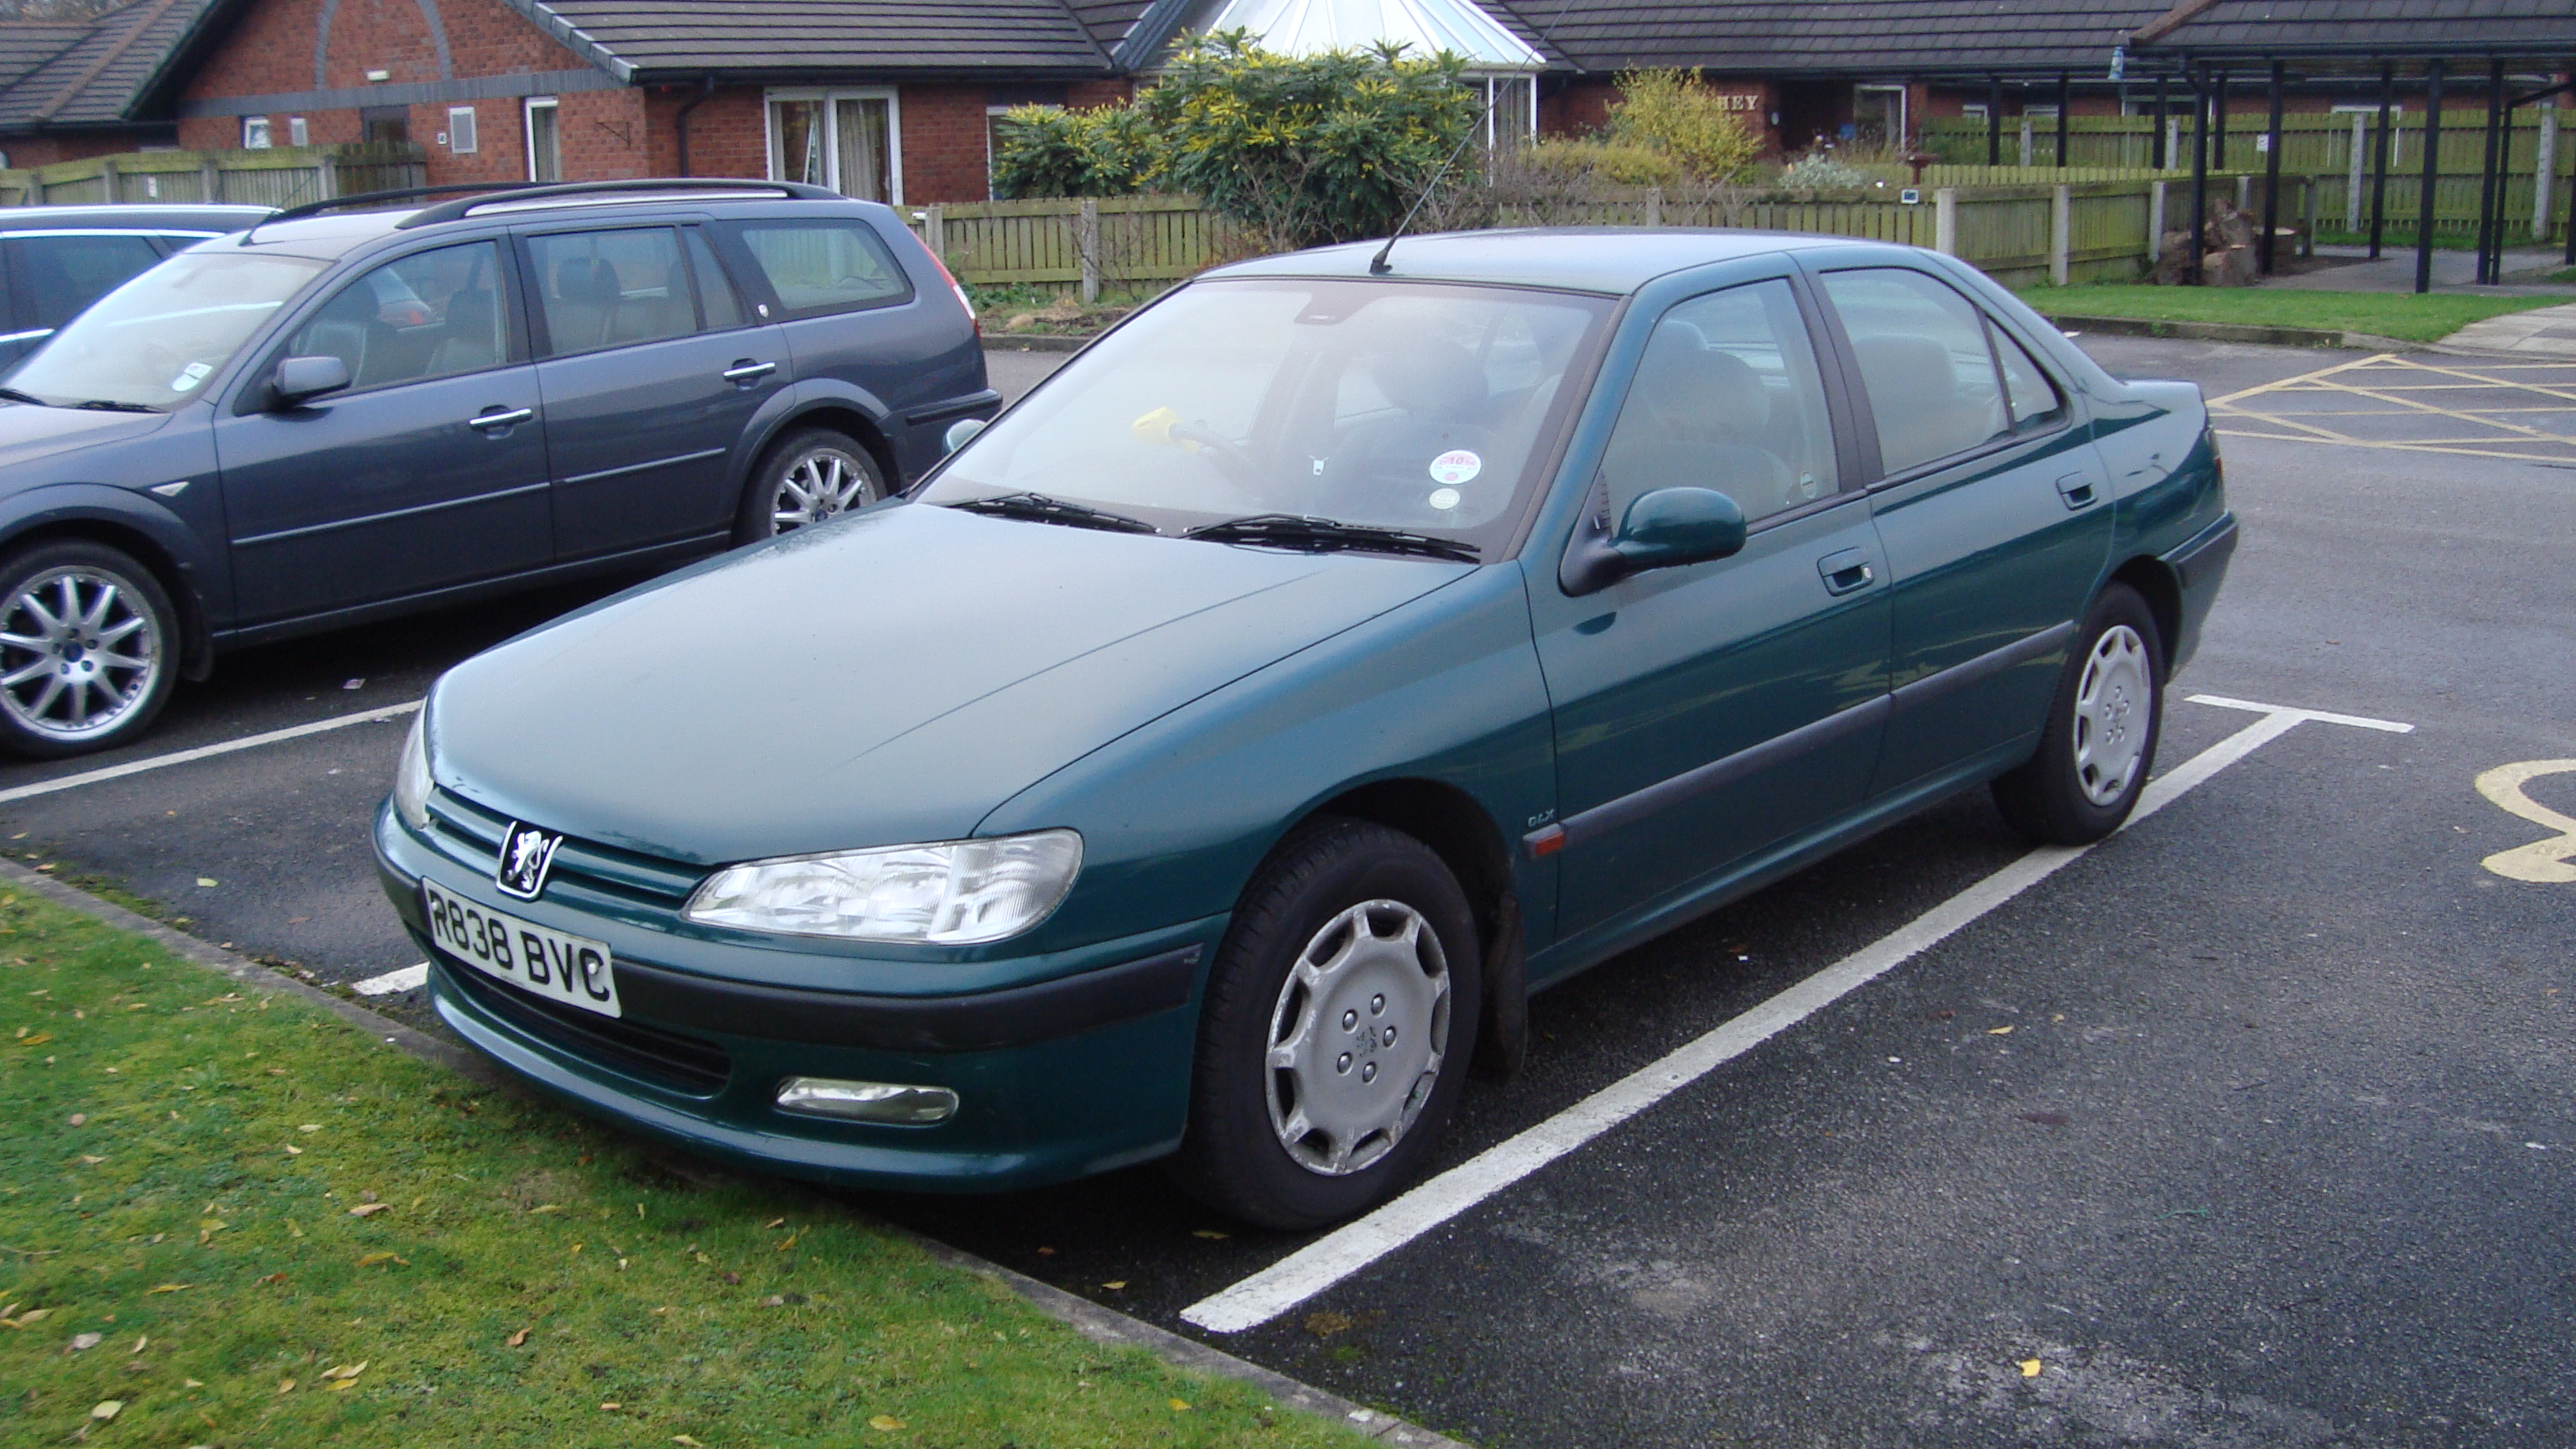 PEUGEOT 406 specs - 1995, 1996, 1997, 1998, 1999 - autoevolution